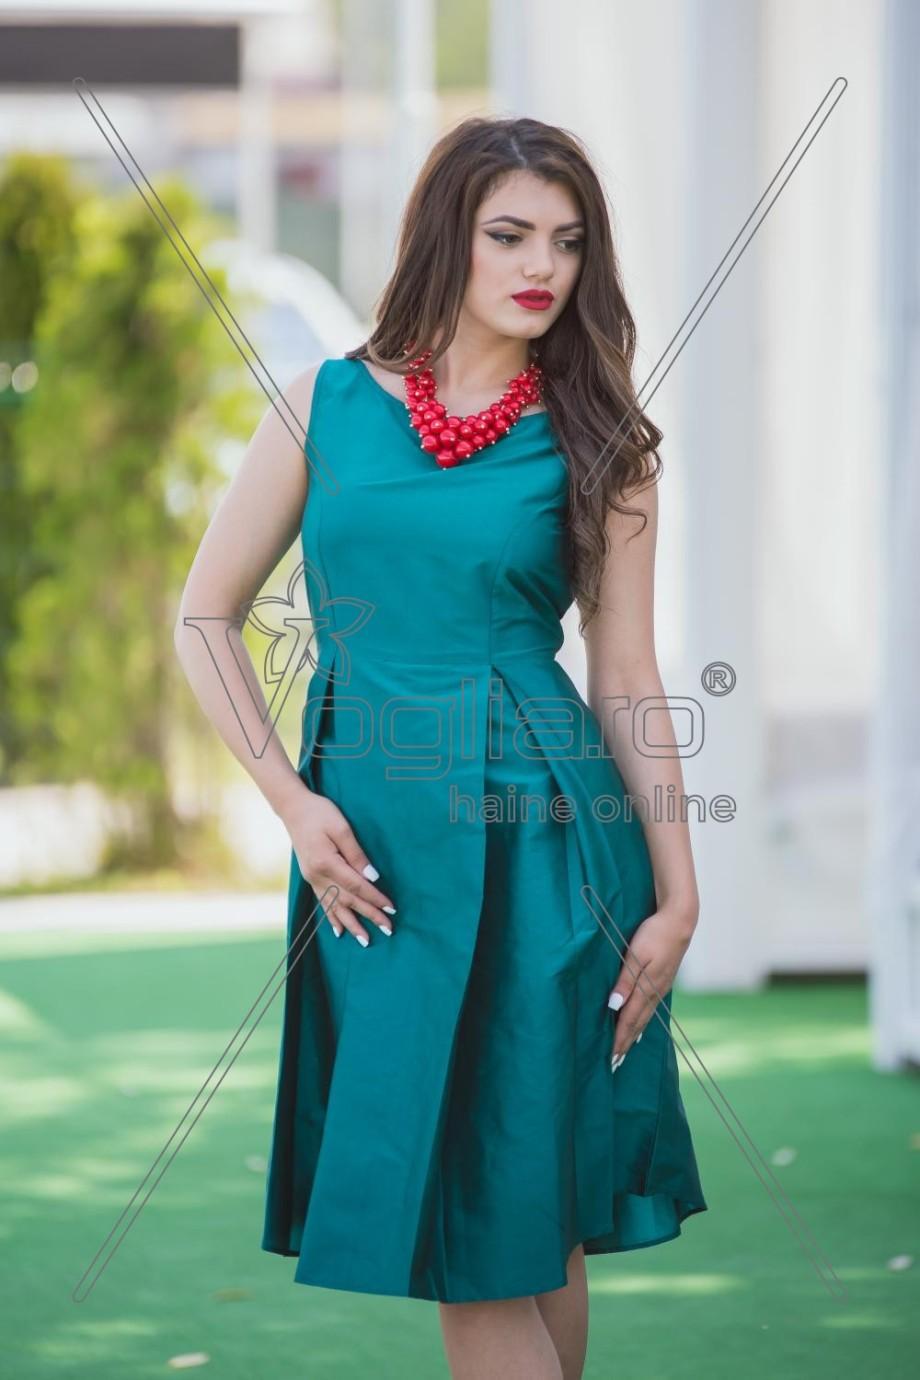 rochie-trei-sferturi-verde-smarald-1498217750-4